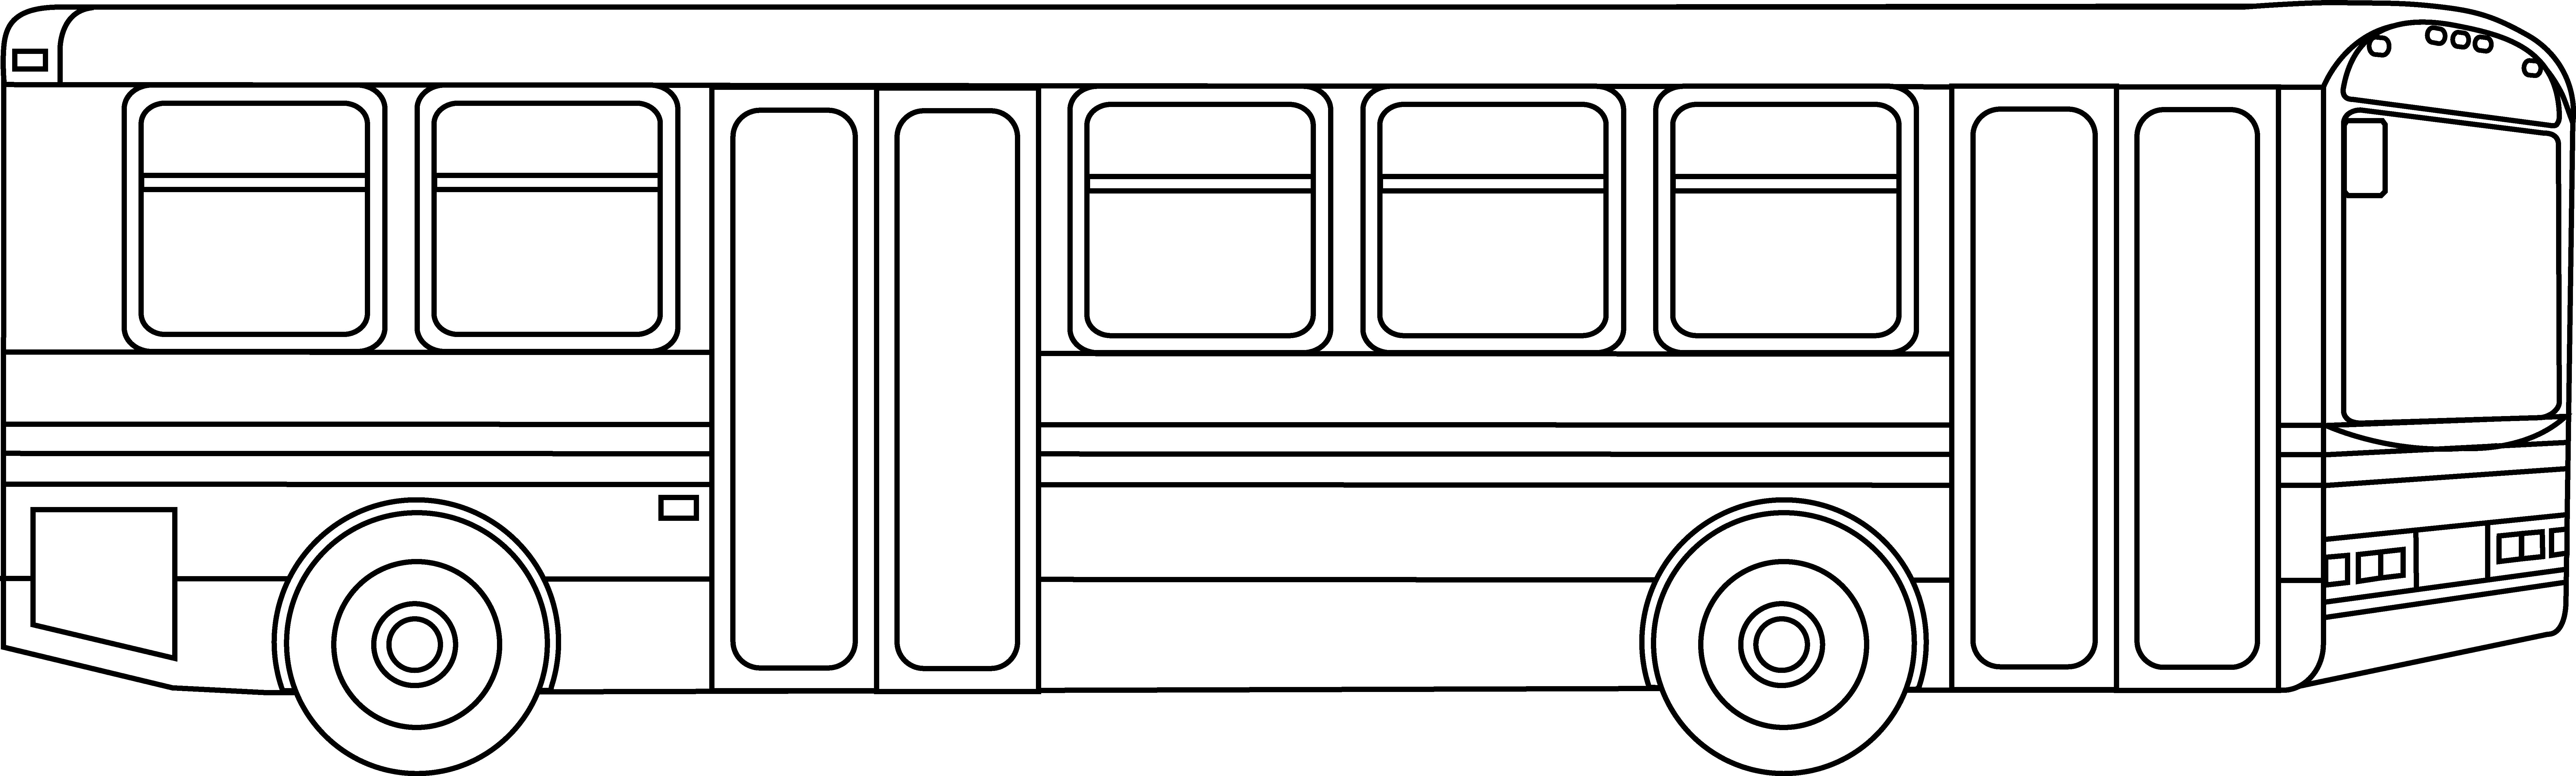 Public transportation outline free. Bus clipart mass transit